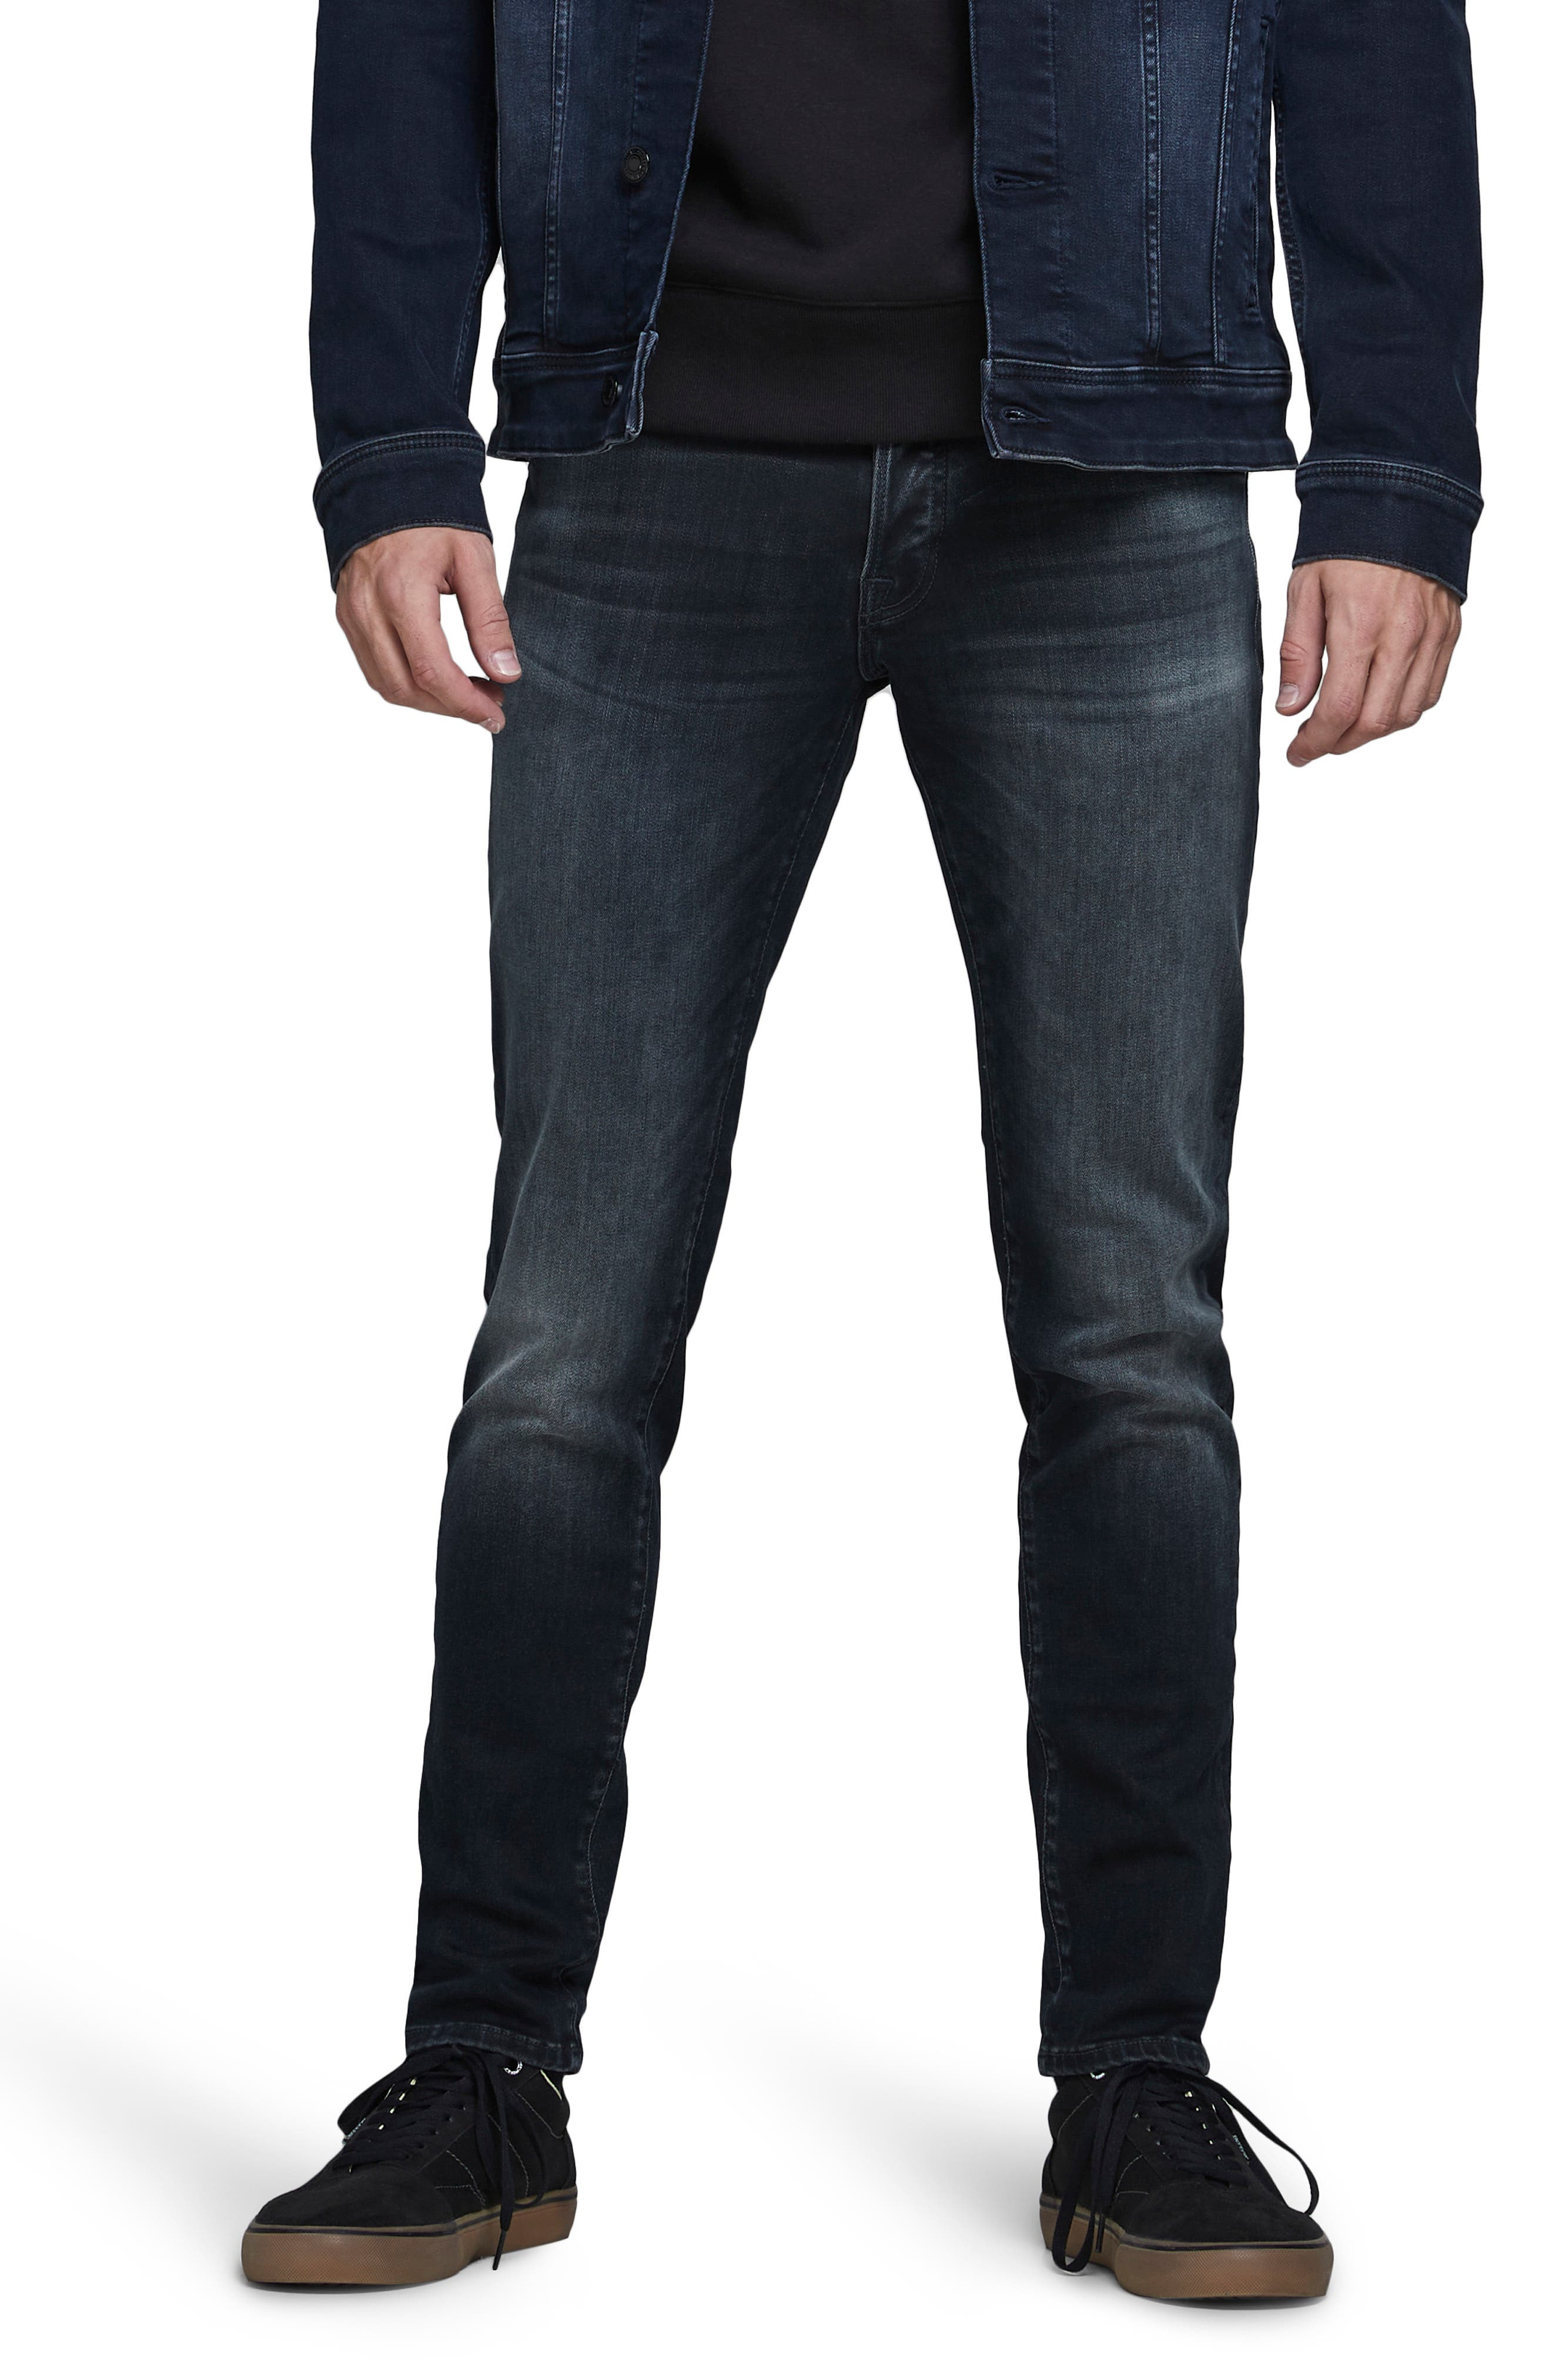 Glenn Fox Agi 104 50Sps Slim Fit Jeans